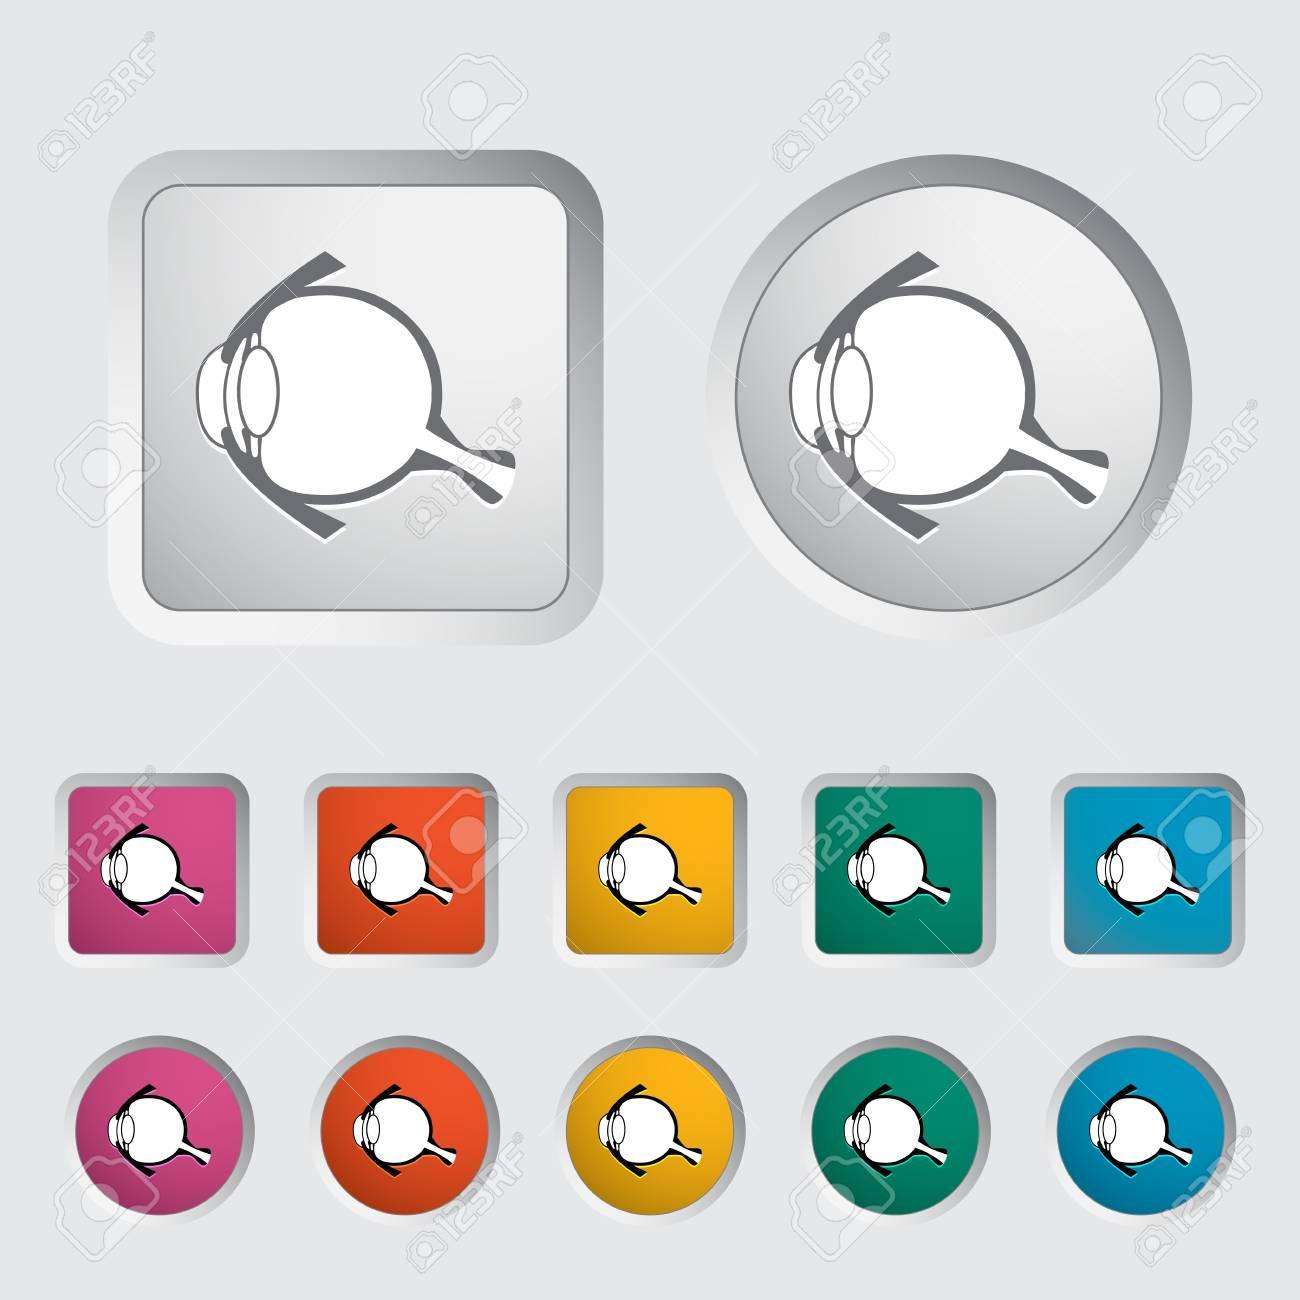 Anatomy eye icon  Vector illustration Stock Vector - 16786832